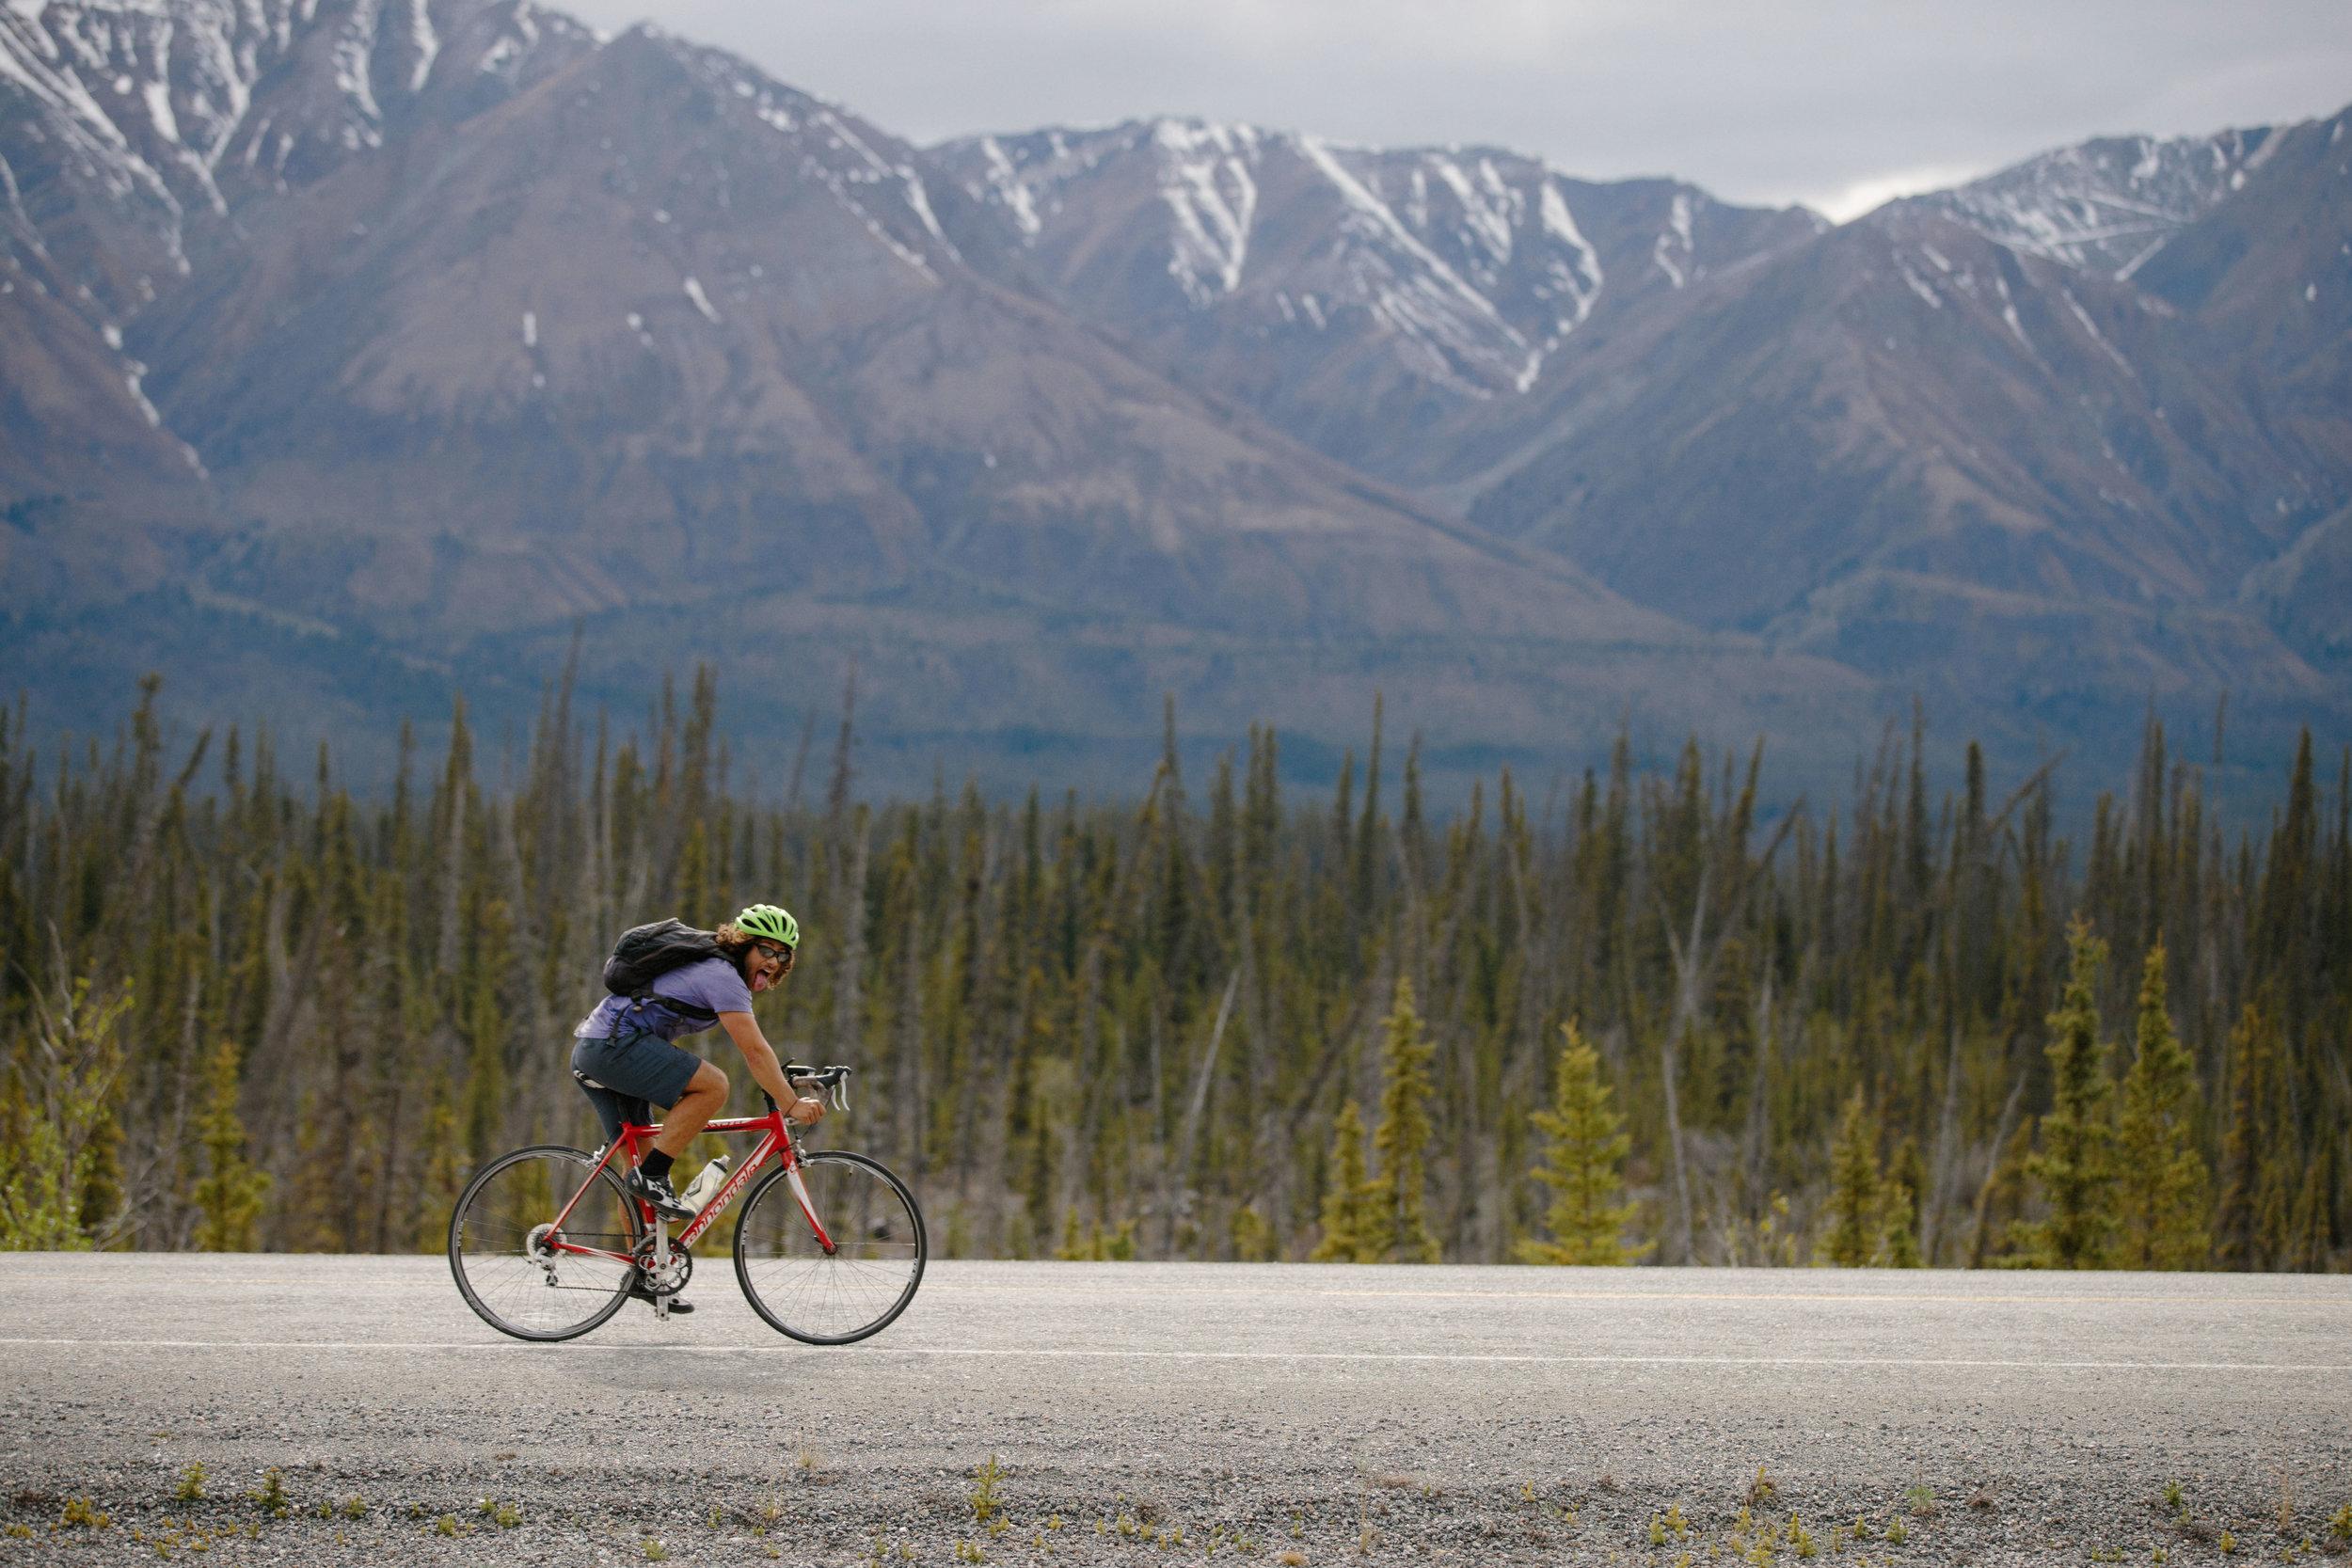 05:27 — YeehawDonkey_CLIF_Alaska_0516.jpg